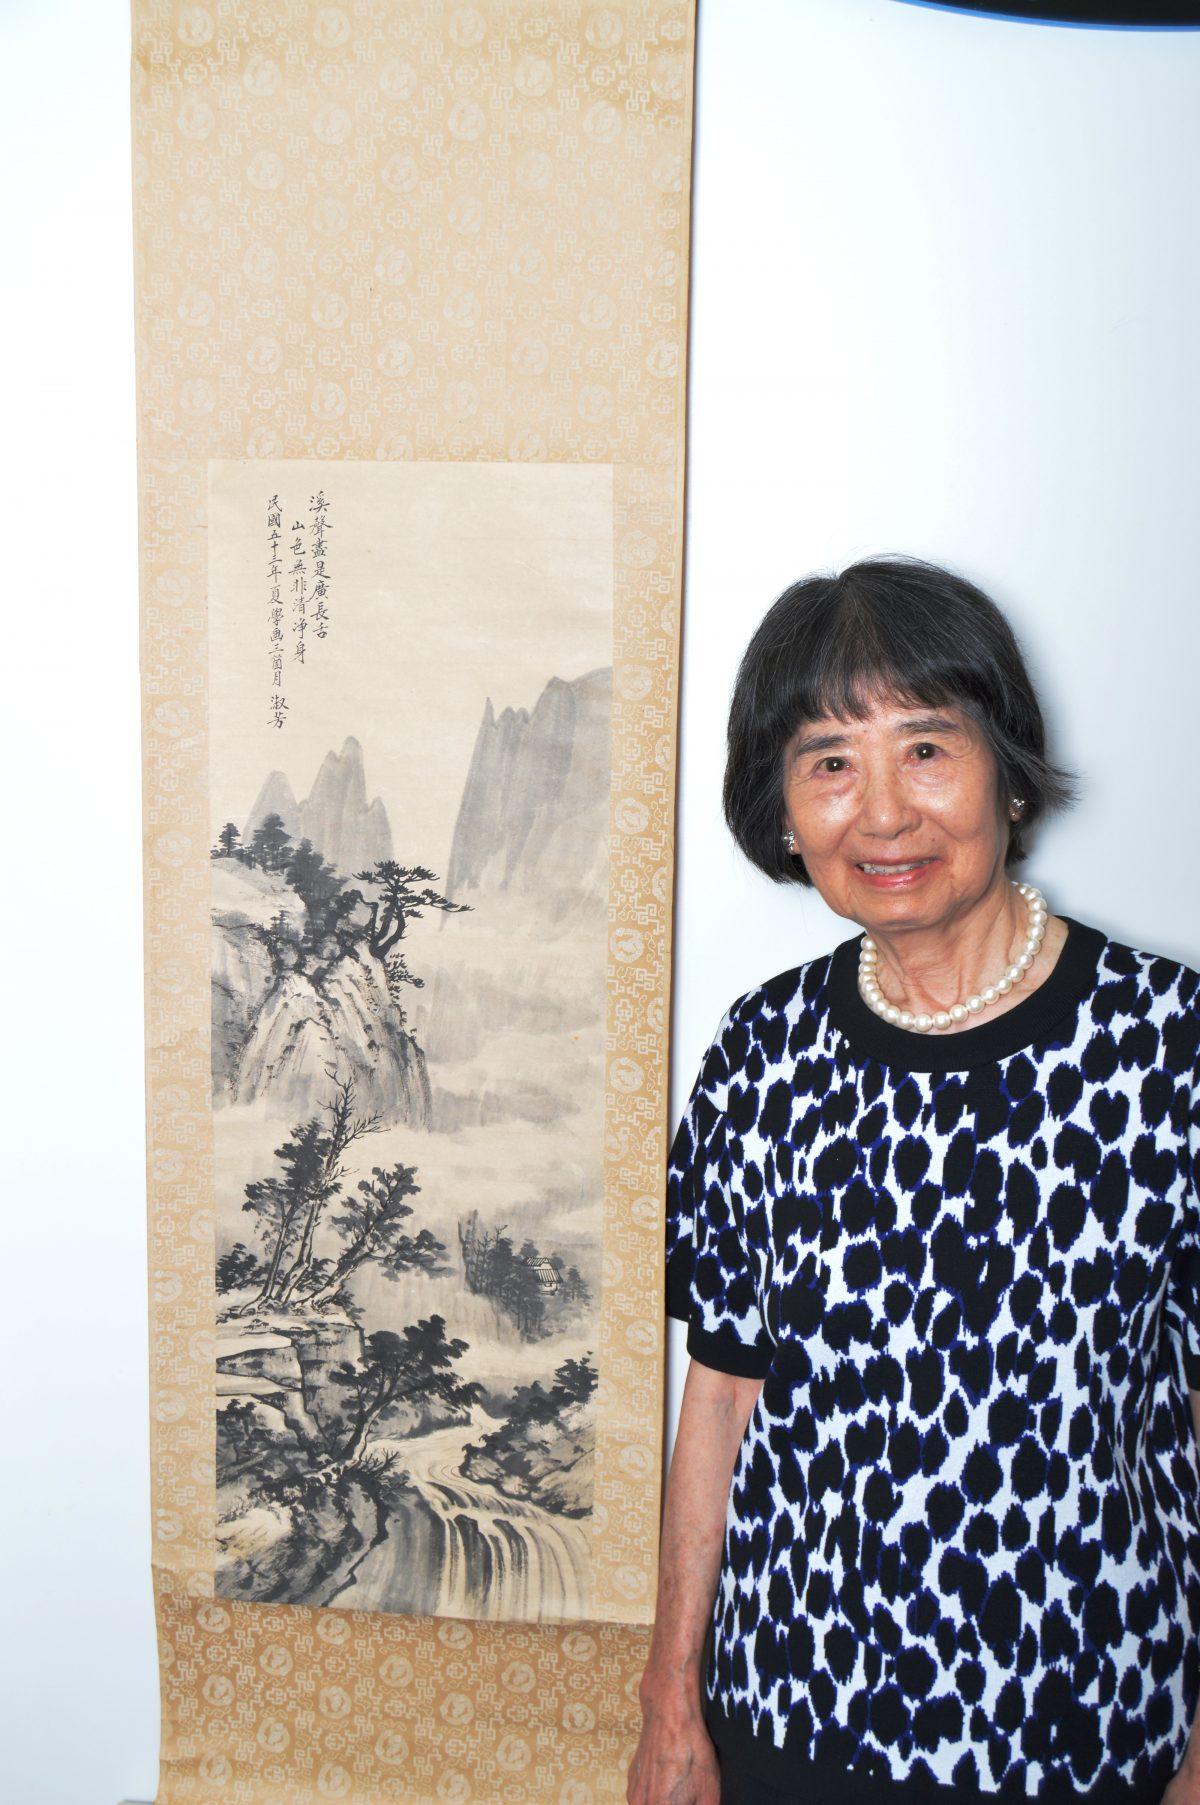 Taiwanese-American Professor Emerita Embodies Lifelong Learning